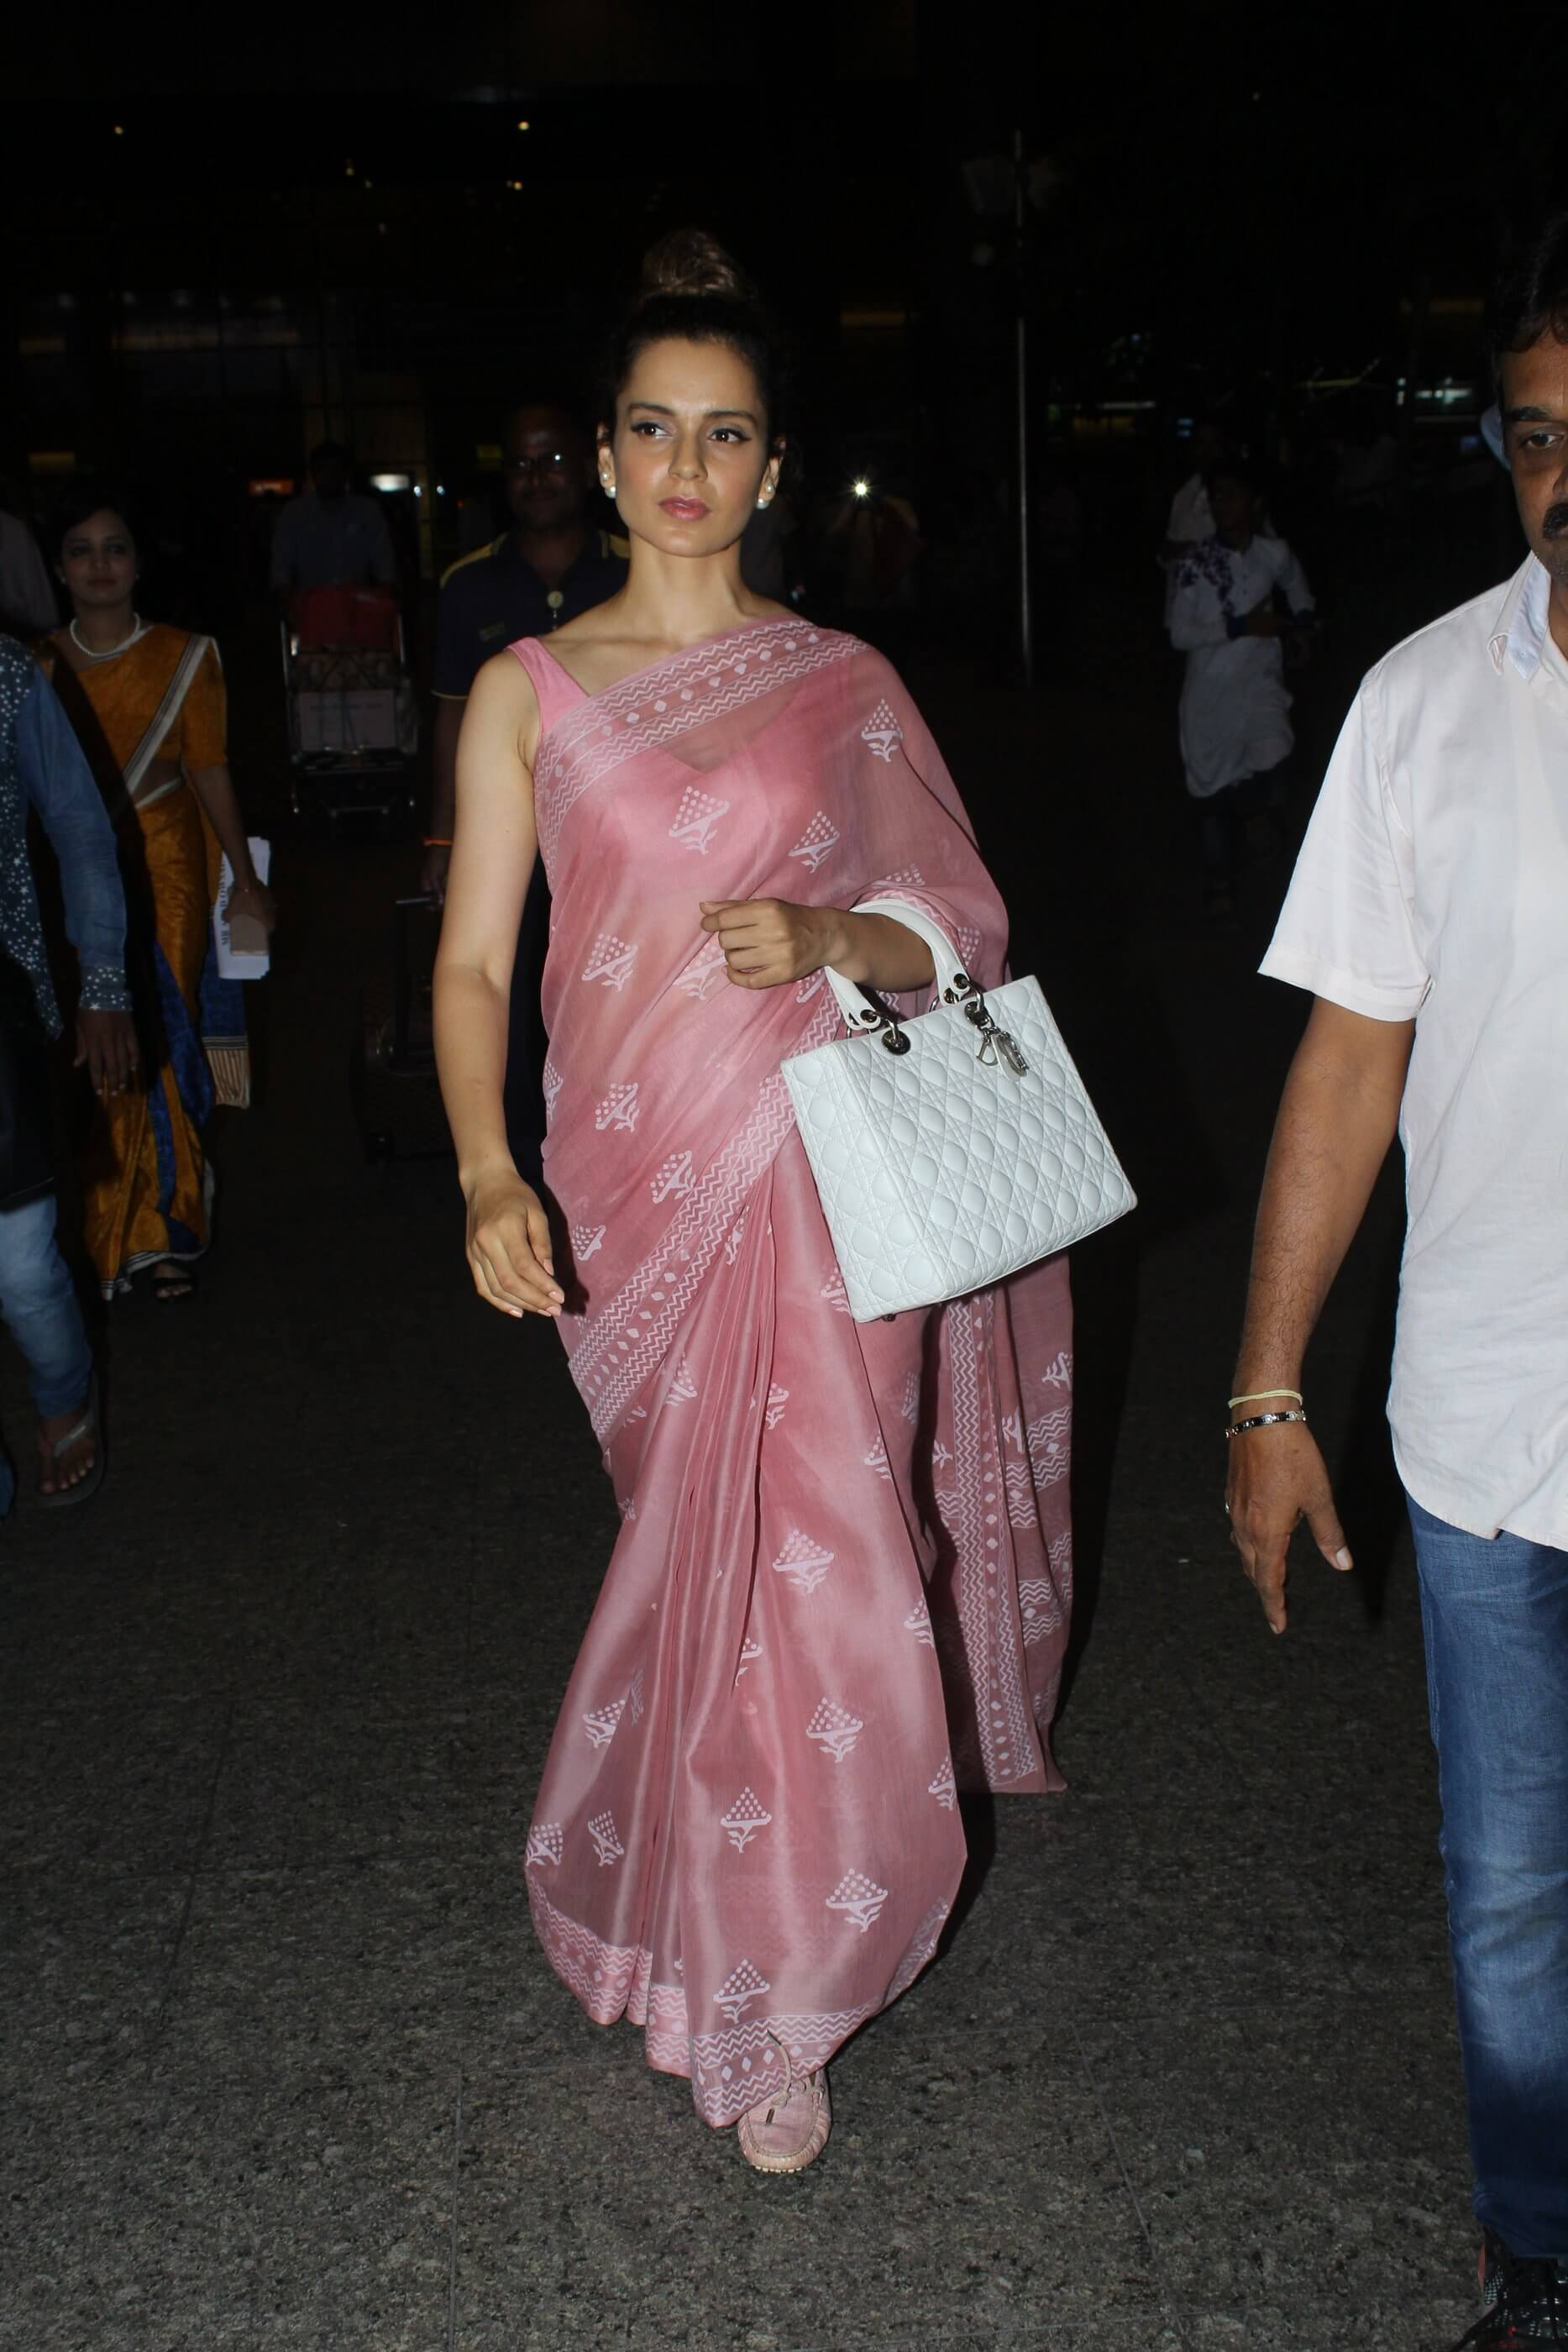 PunjabKesari, Nari, kangana wore saree with loafers image